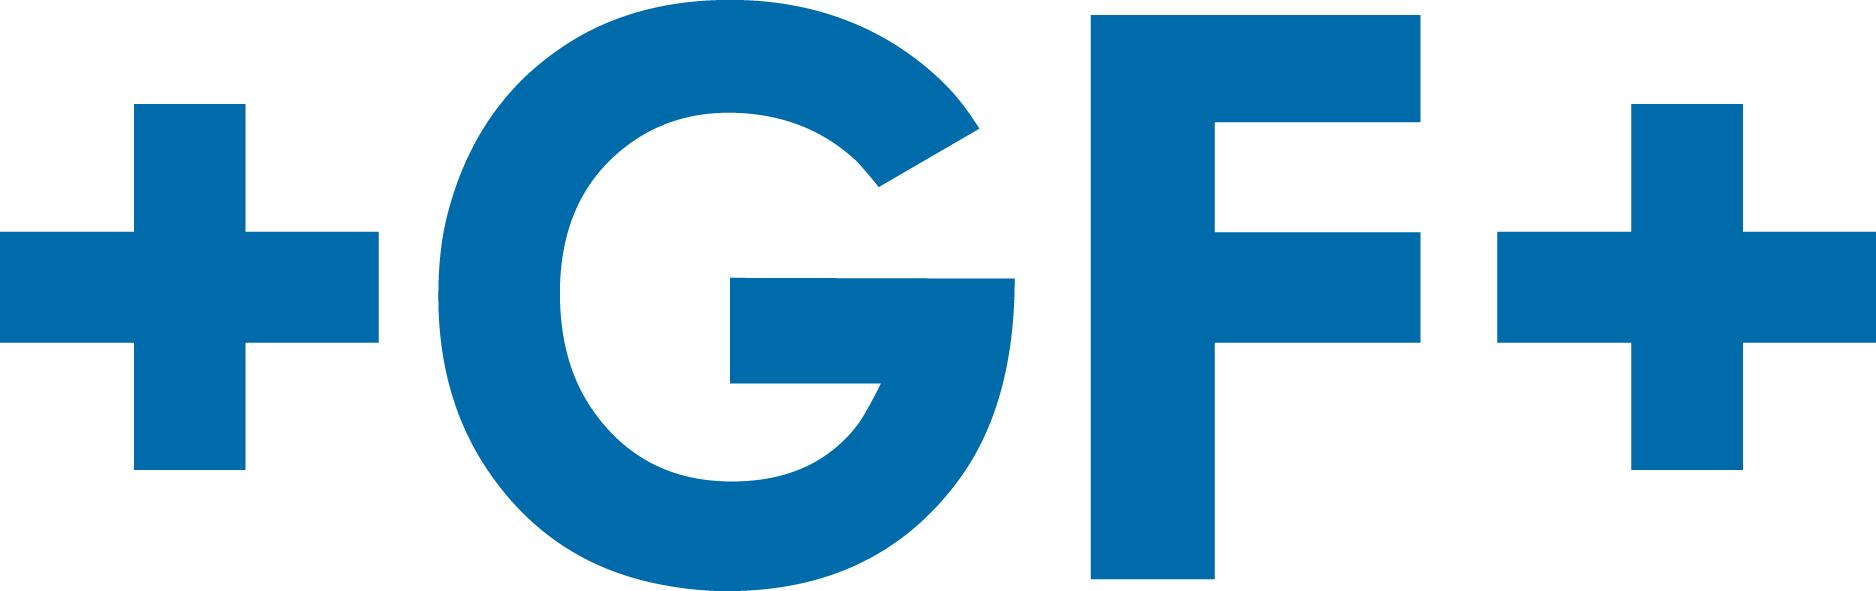 GF Casting Solutions S.R.L.